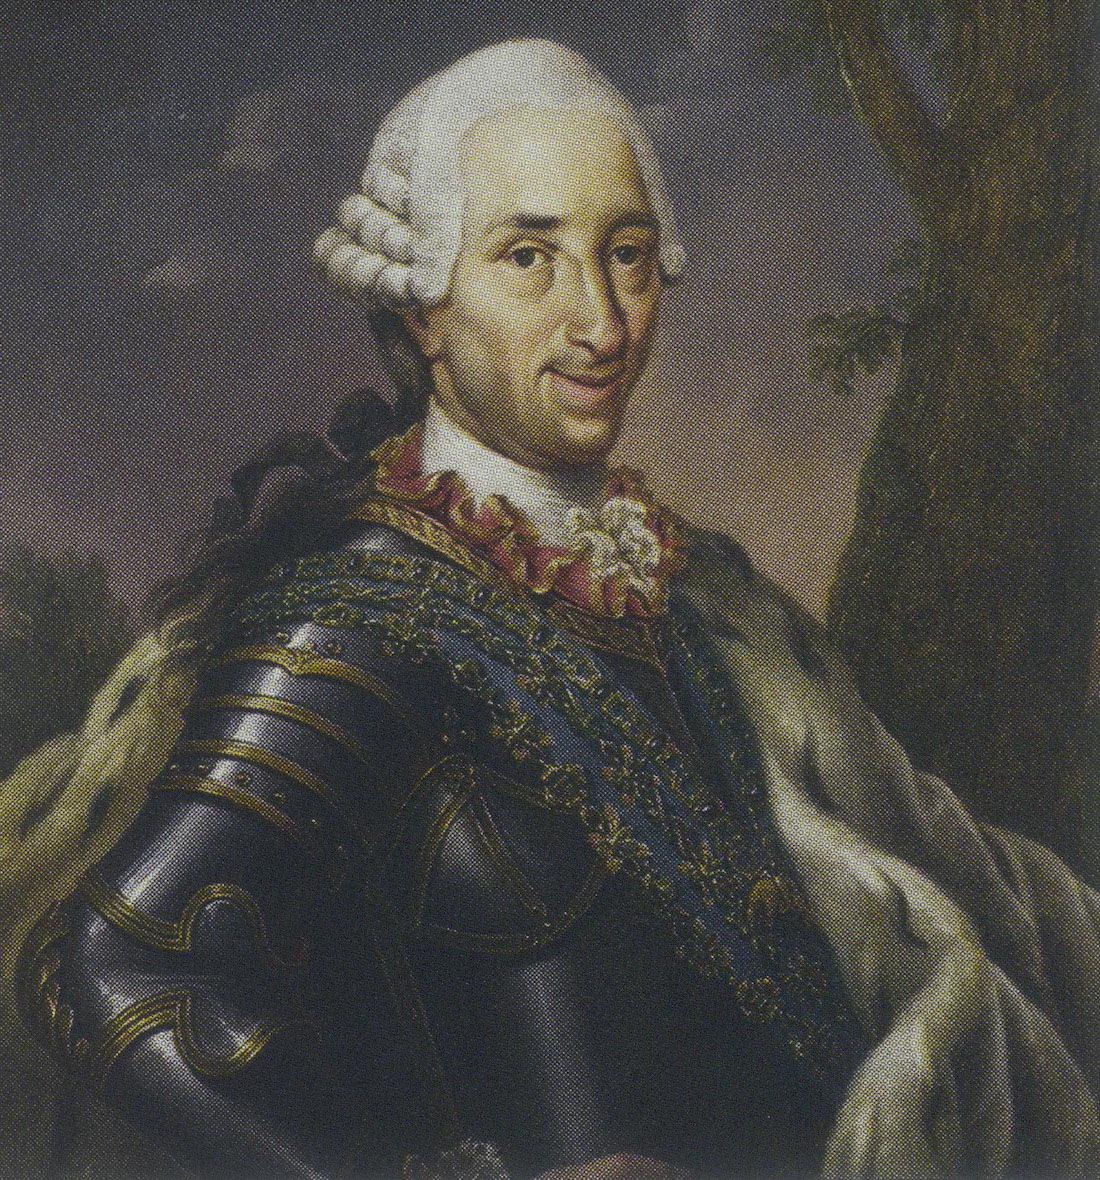 Портрет испанского короля Карла III